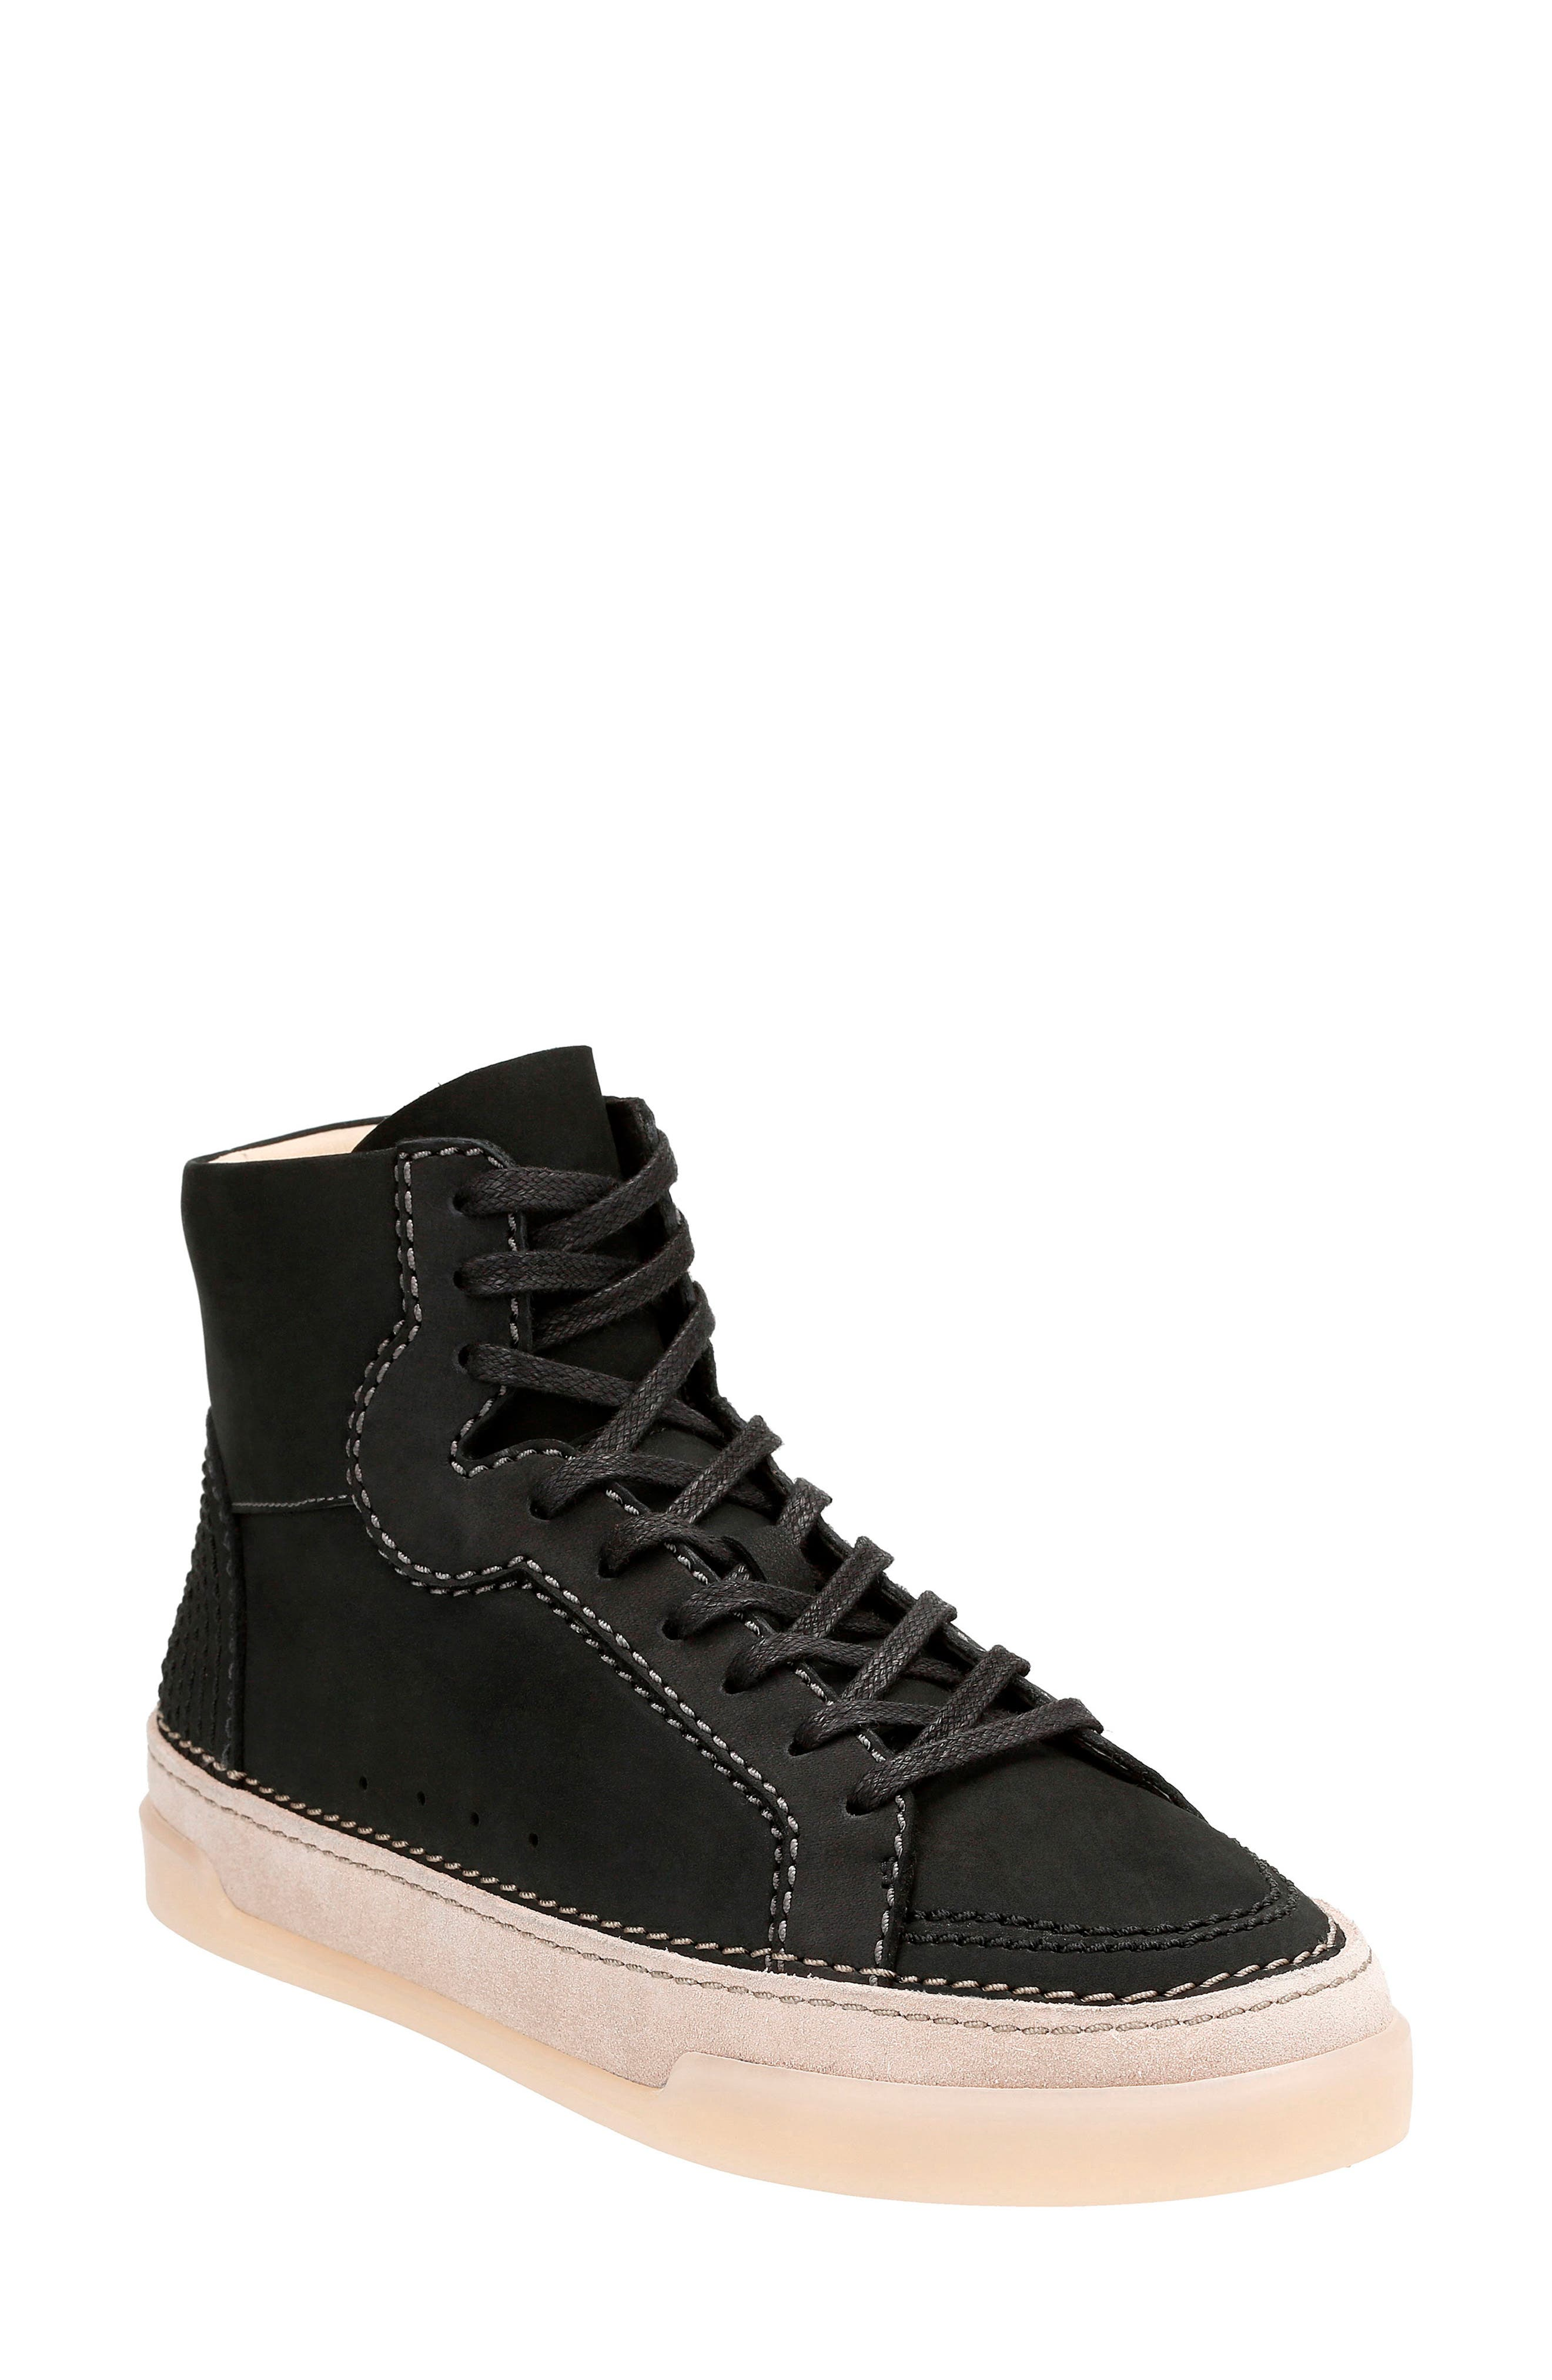 Hidi Haze High Top Sneaker,                             Main thumbnail 1, color,